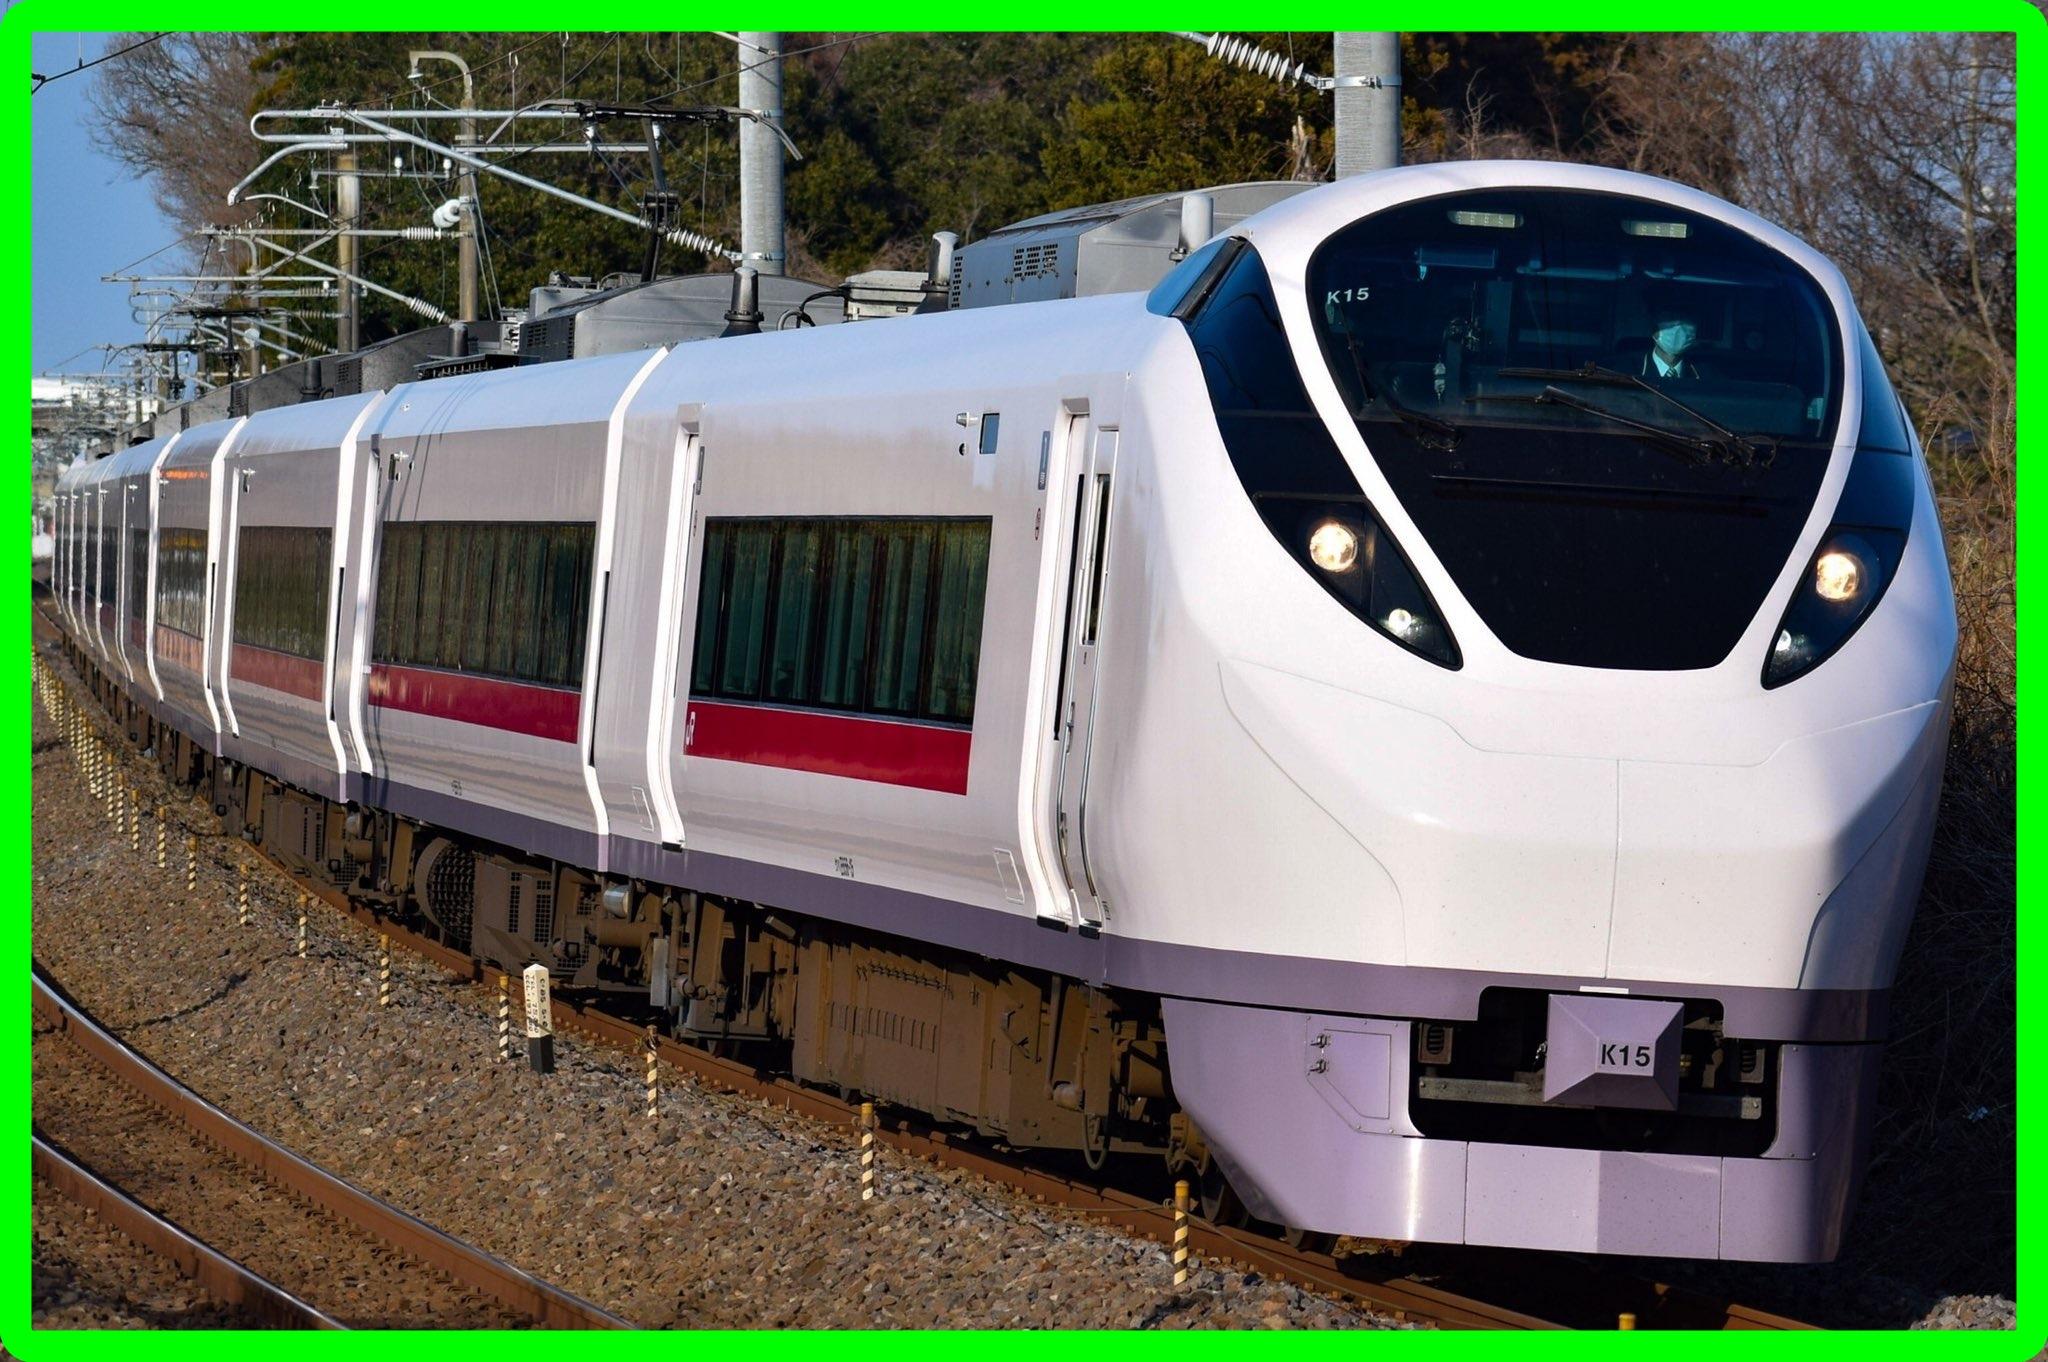 JR東日本、常磐線特急「ひたち」半額きっぷ発売 品川~仙台全線運転再開1周年、東北DCで発売